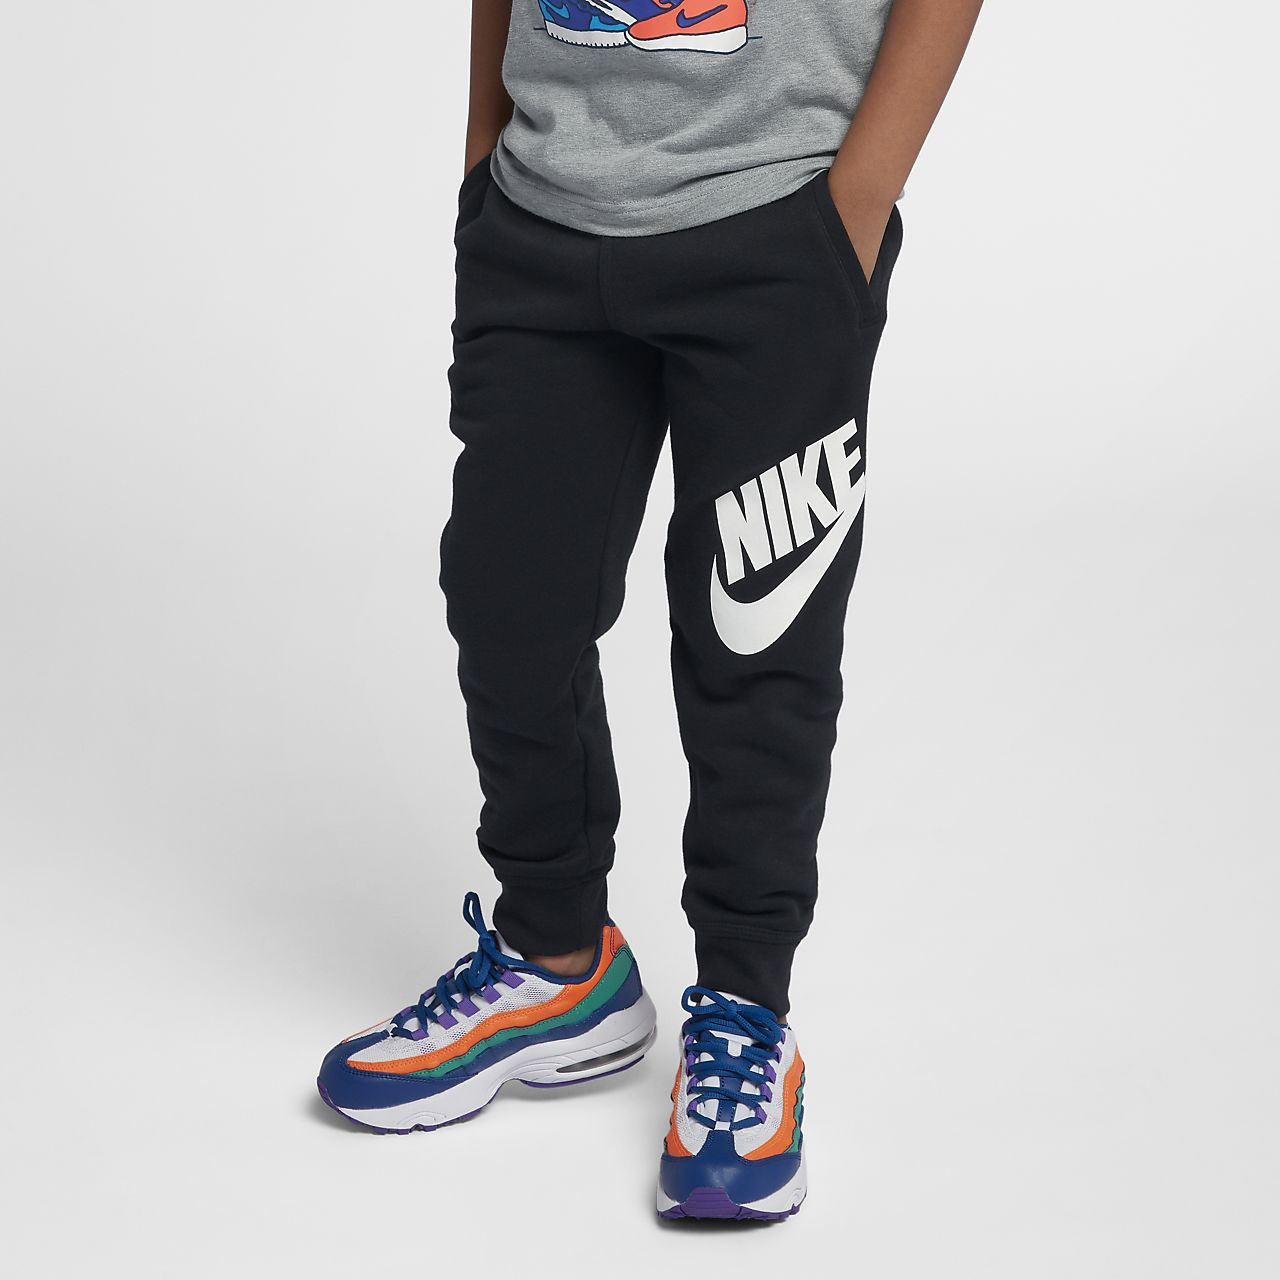 Pantaloni Nike - Bambini